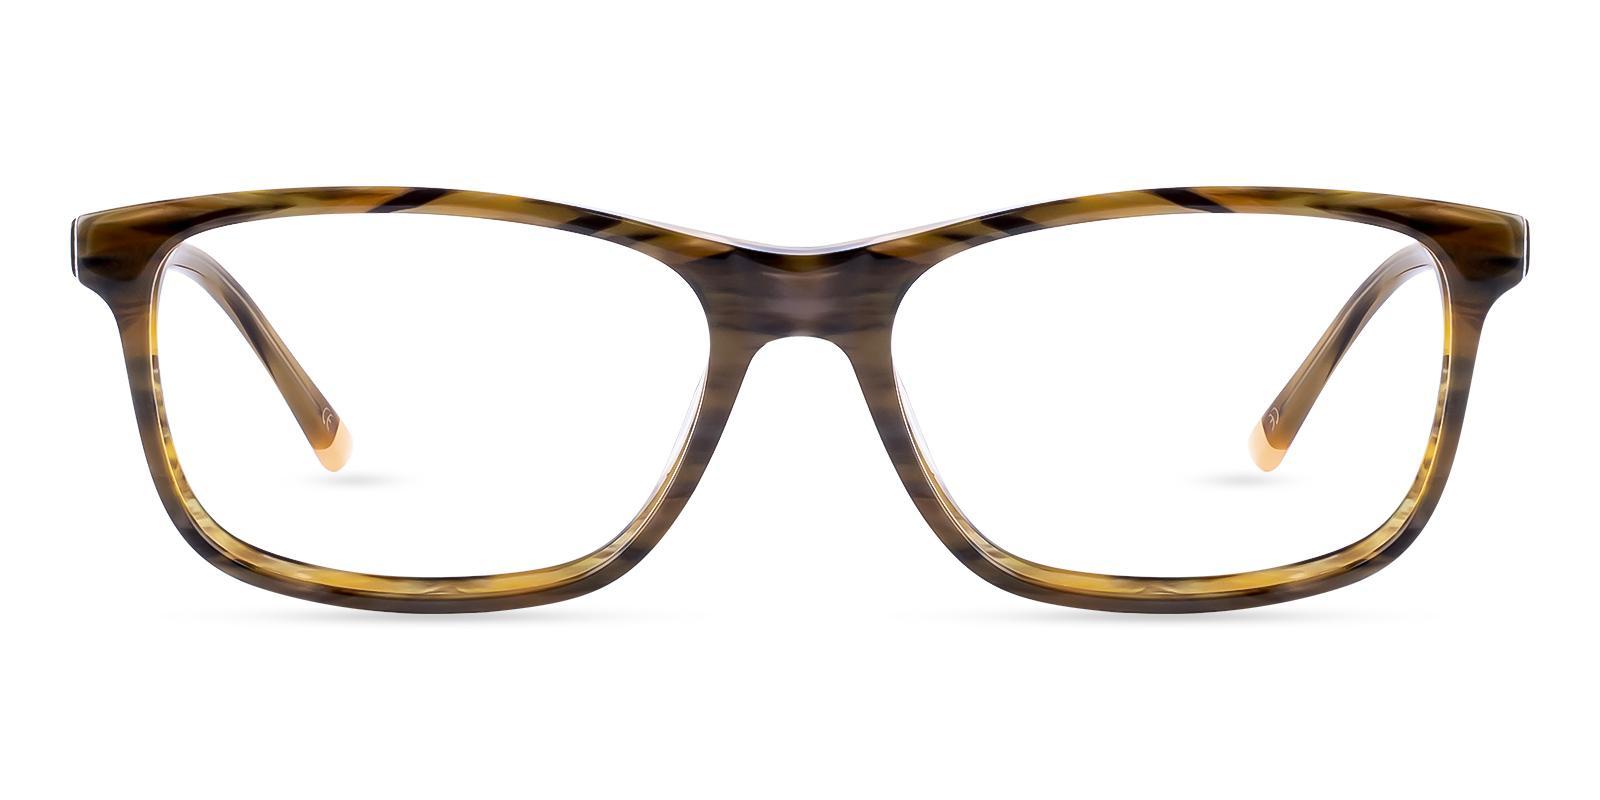 Gilcres Striped Acetate Eyeglasses , SpringHinges , UniversalBridgeFit Frames from ABBE Glasses